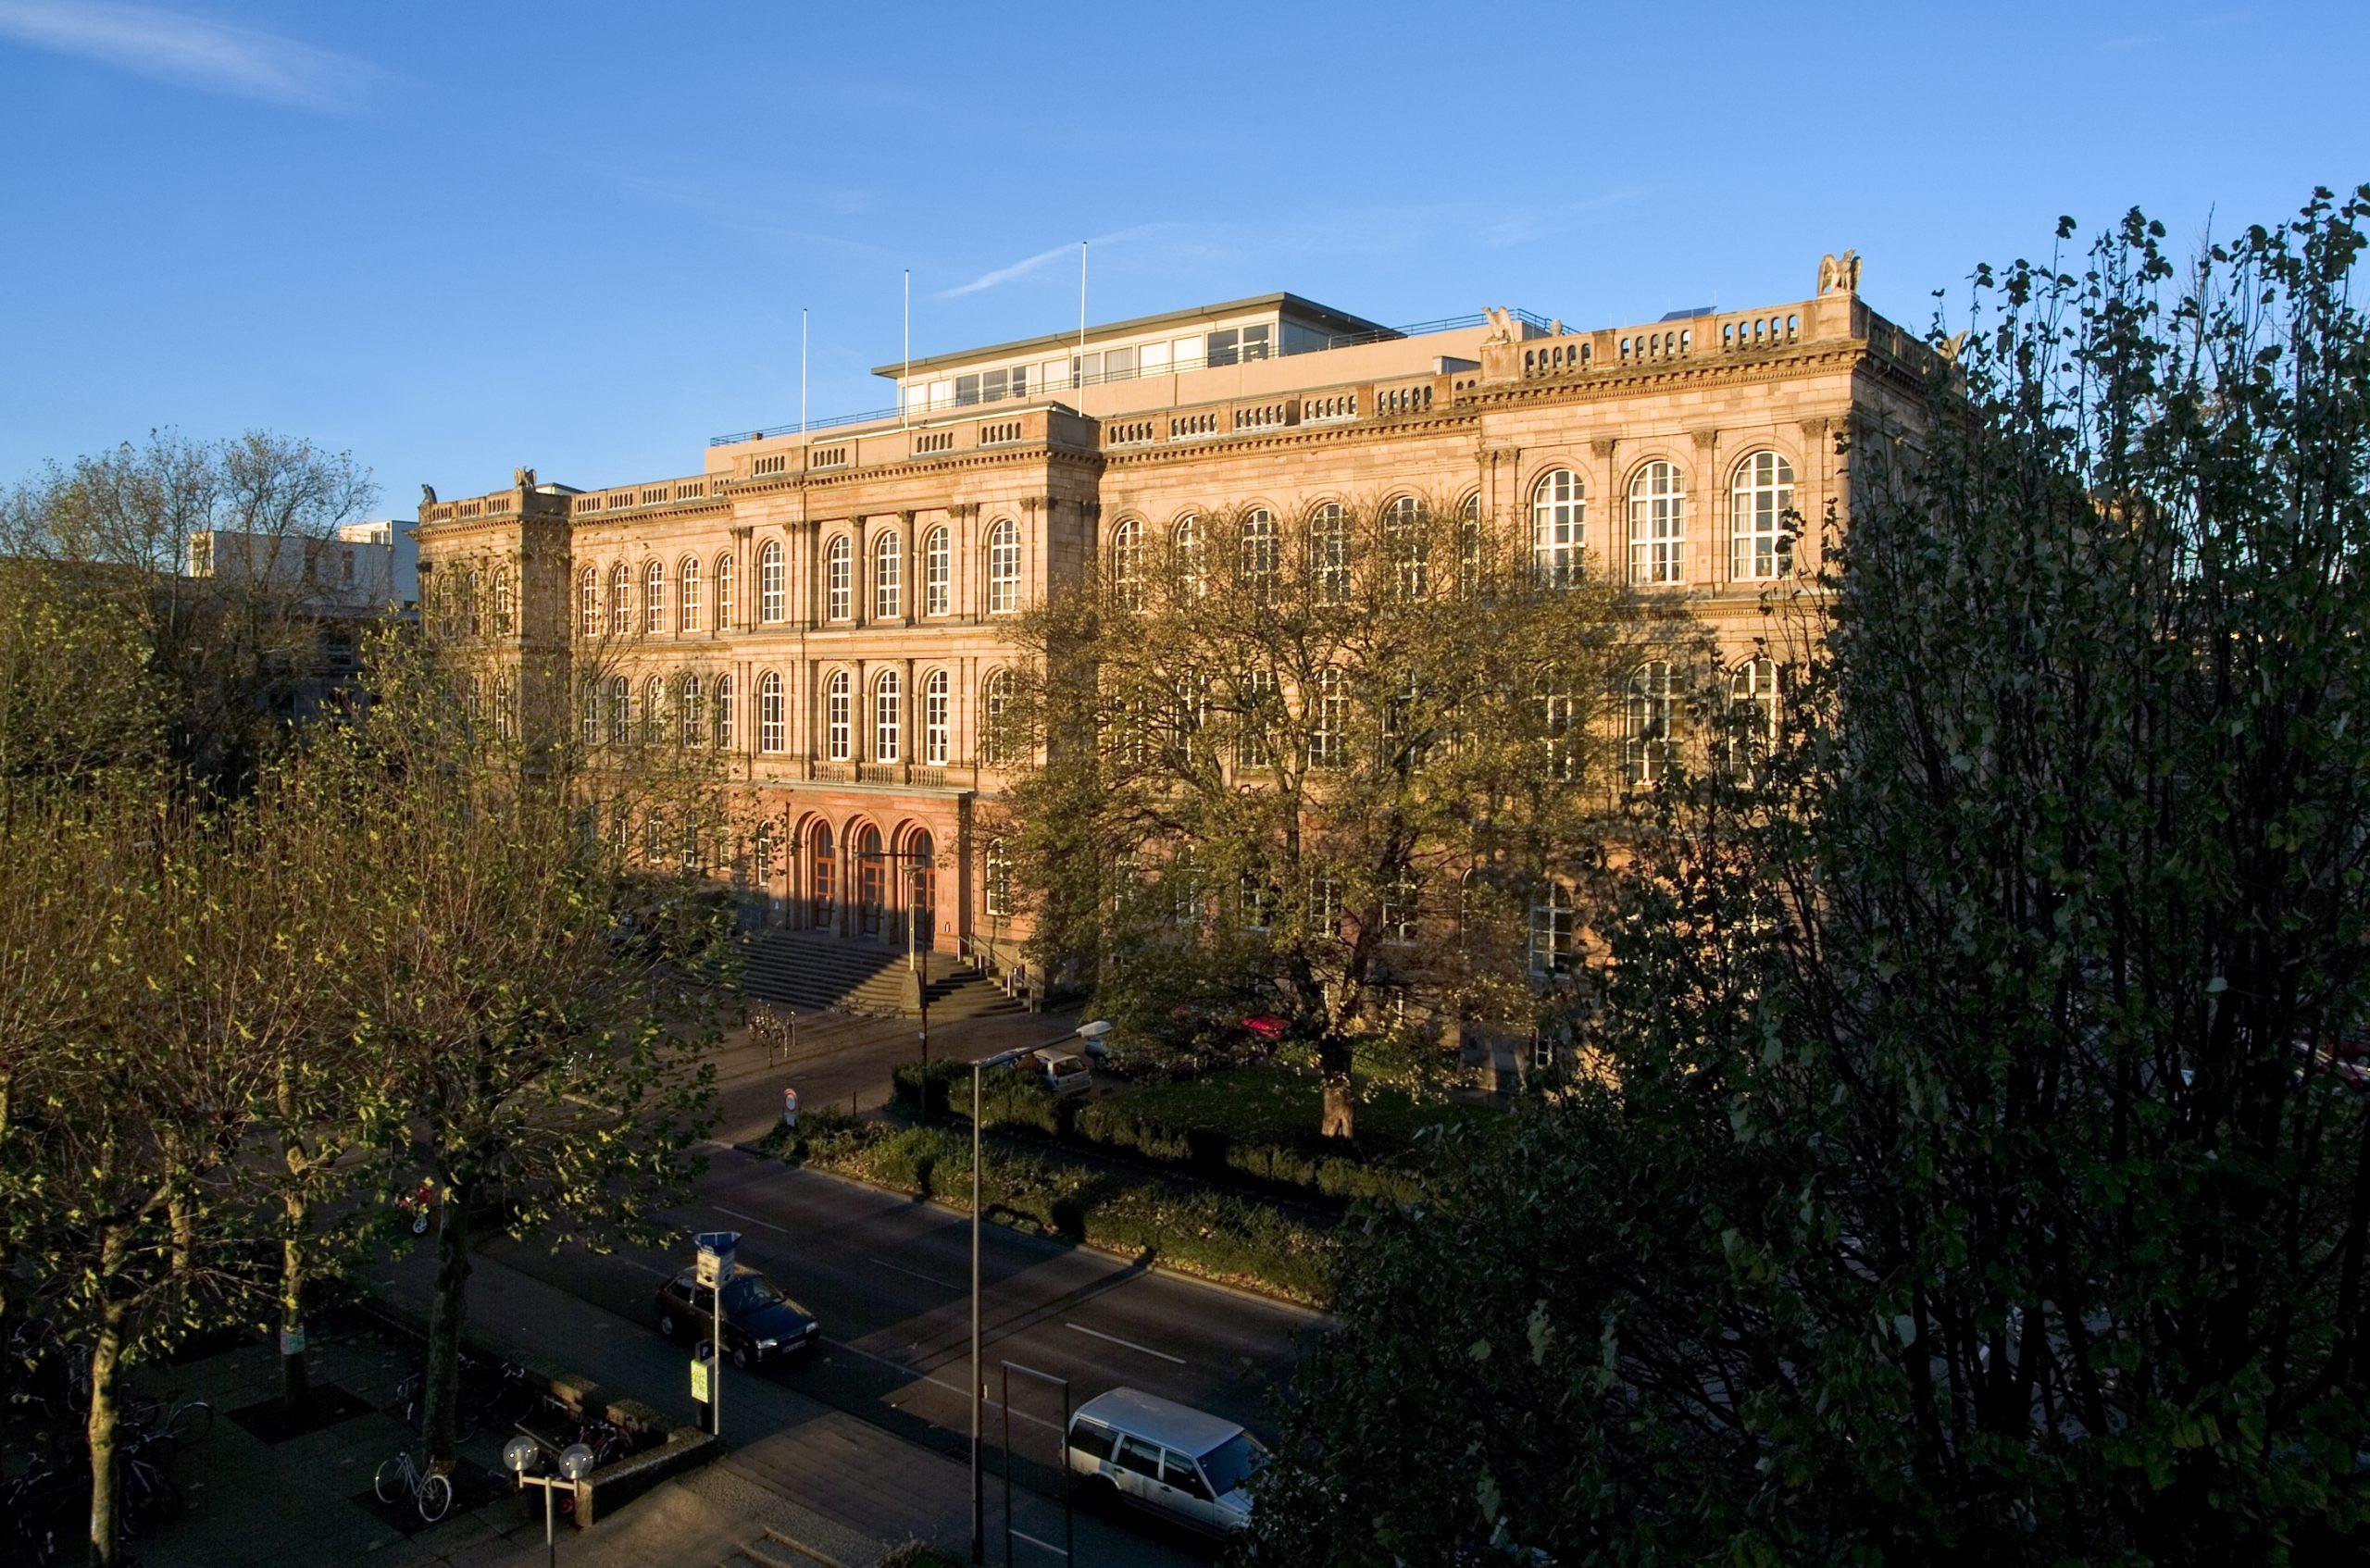 LNS @ RWTH Aachen University (DE)